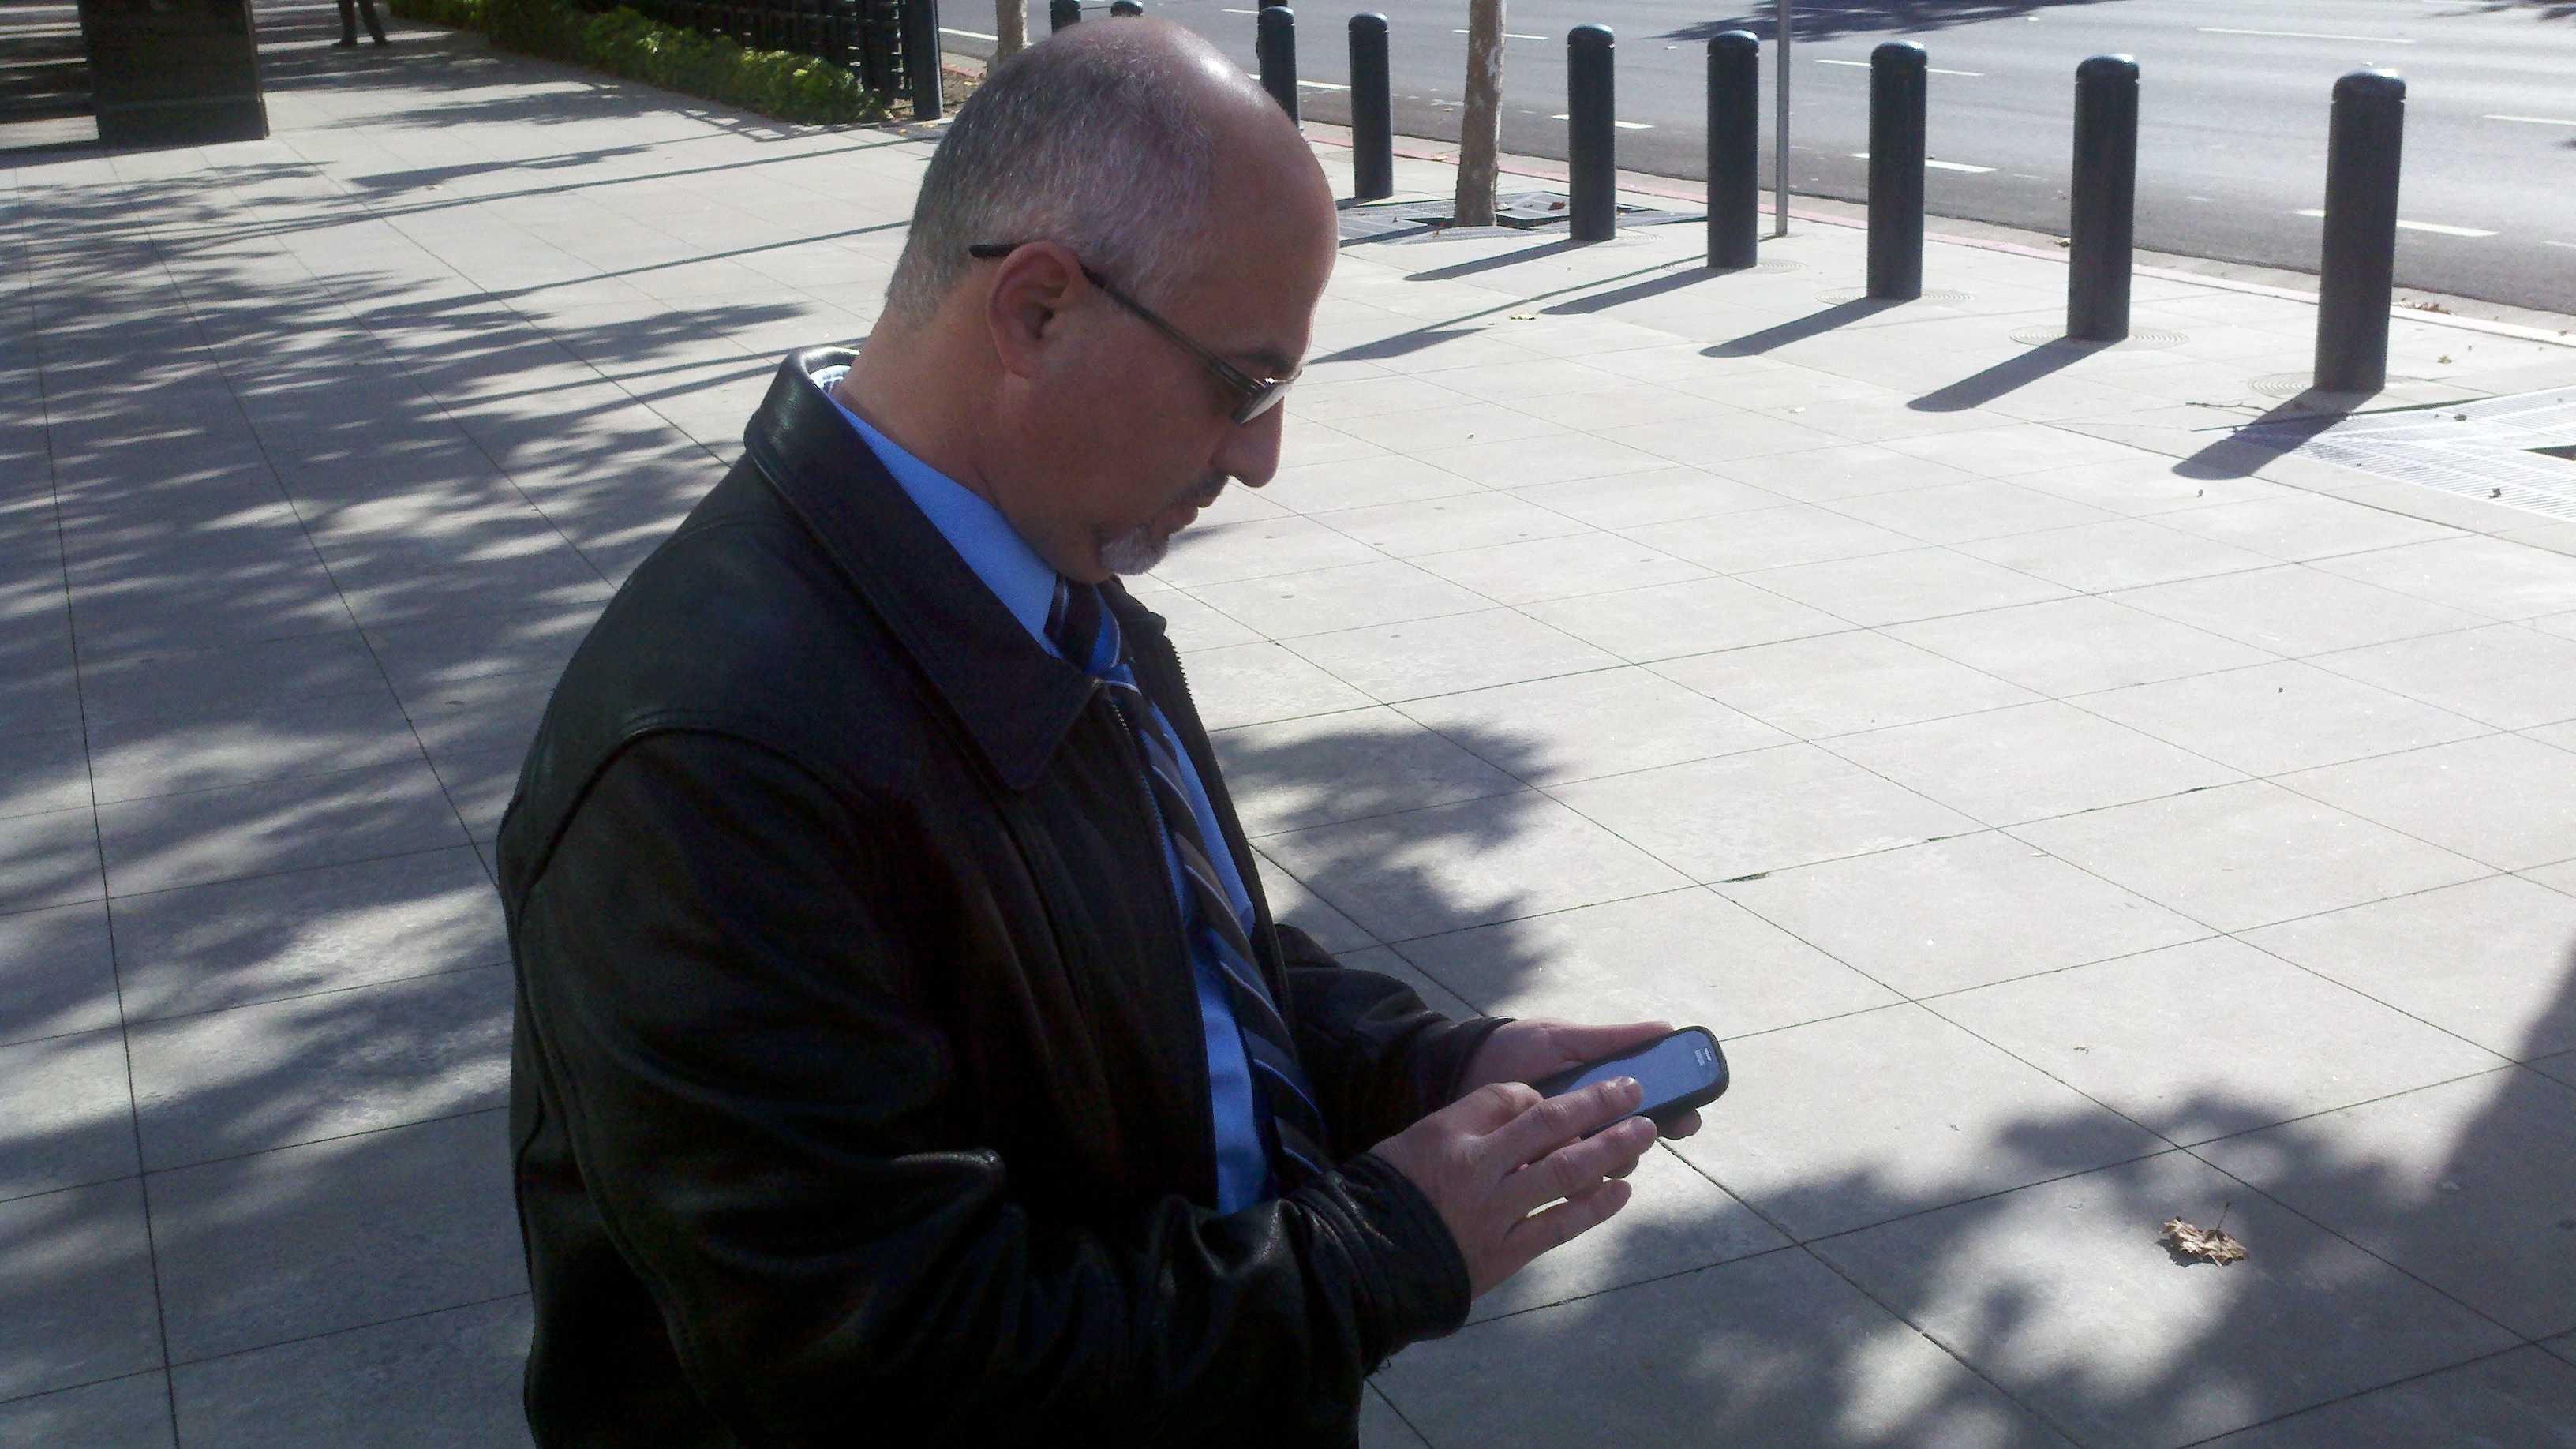 Adeeb Alzanoon checks his smartphone for the latest developments in Gaza.